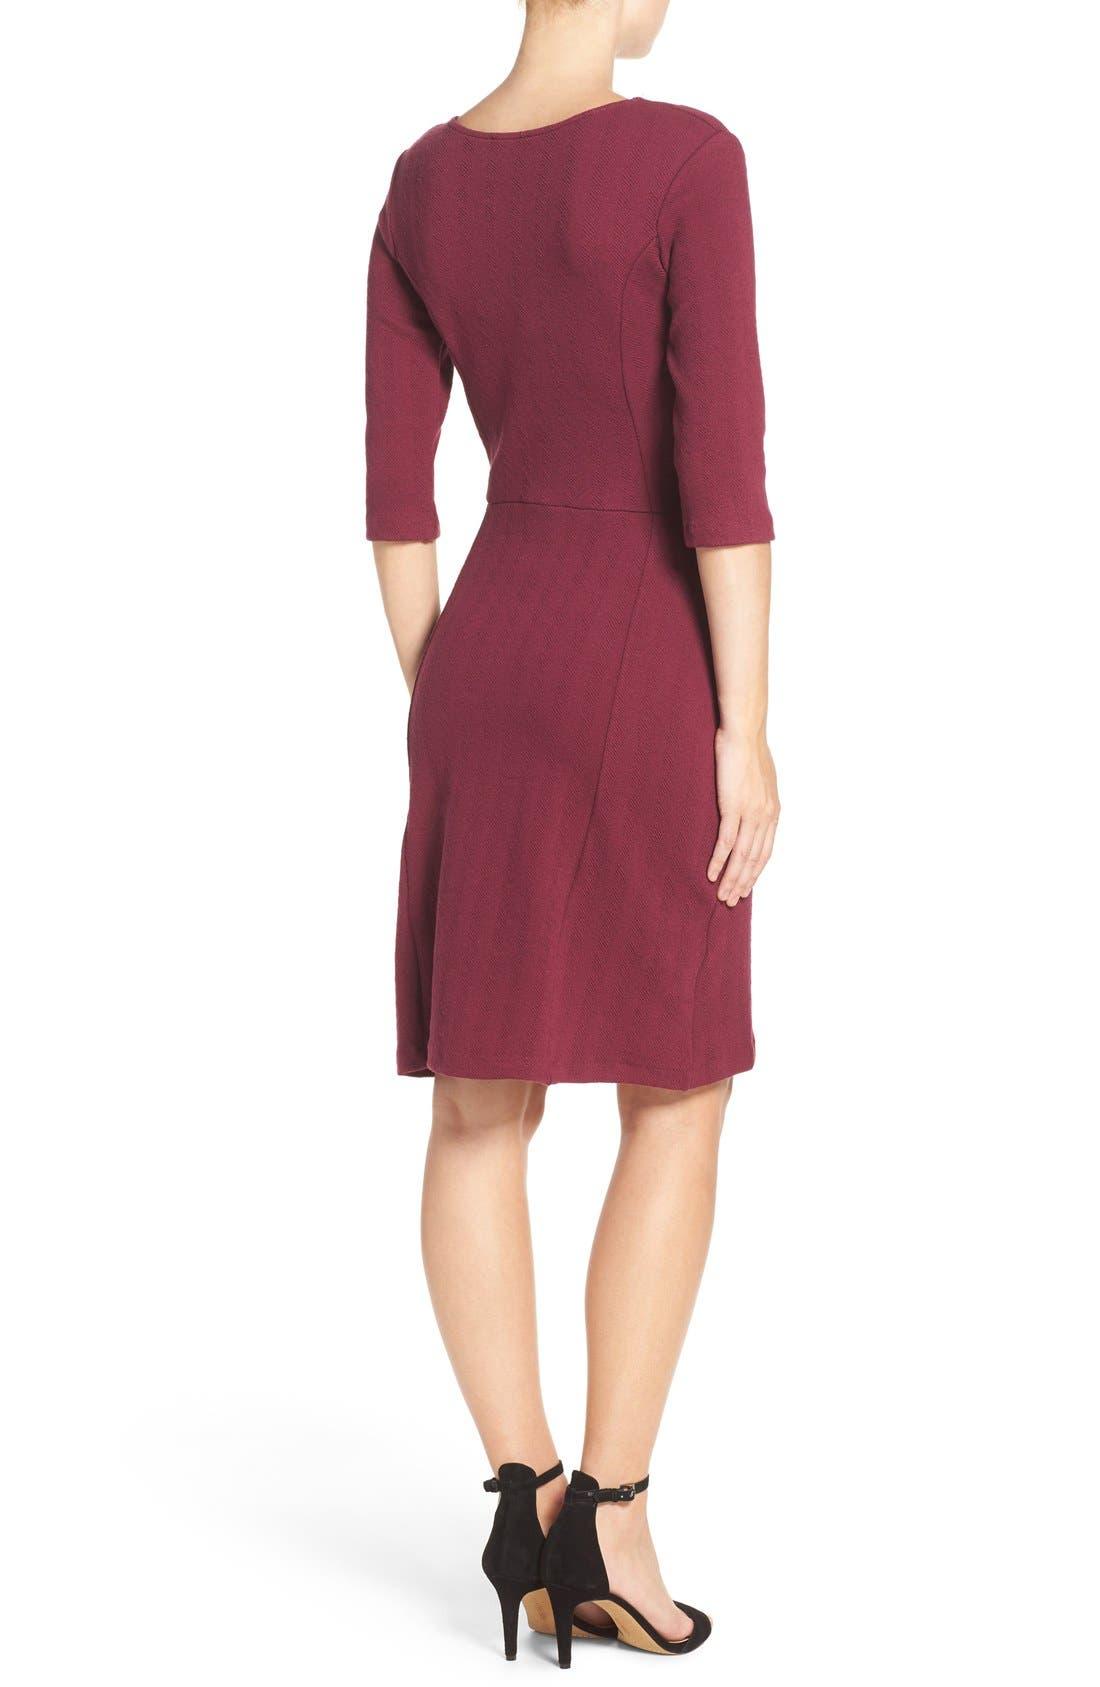 Alternate Image 2  - Leota 'Avery' Jacquard Knit Sheath Dress